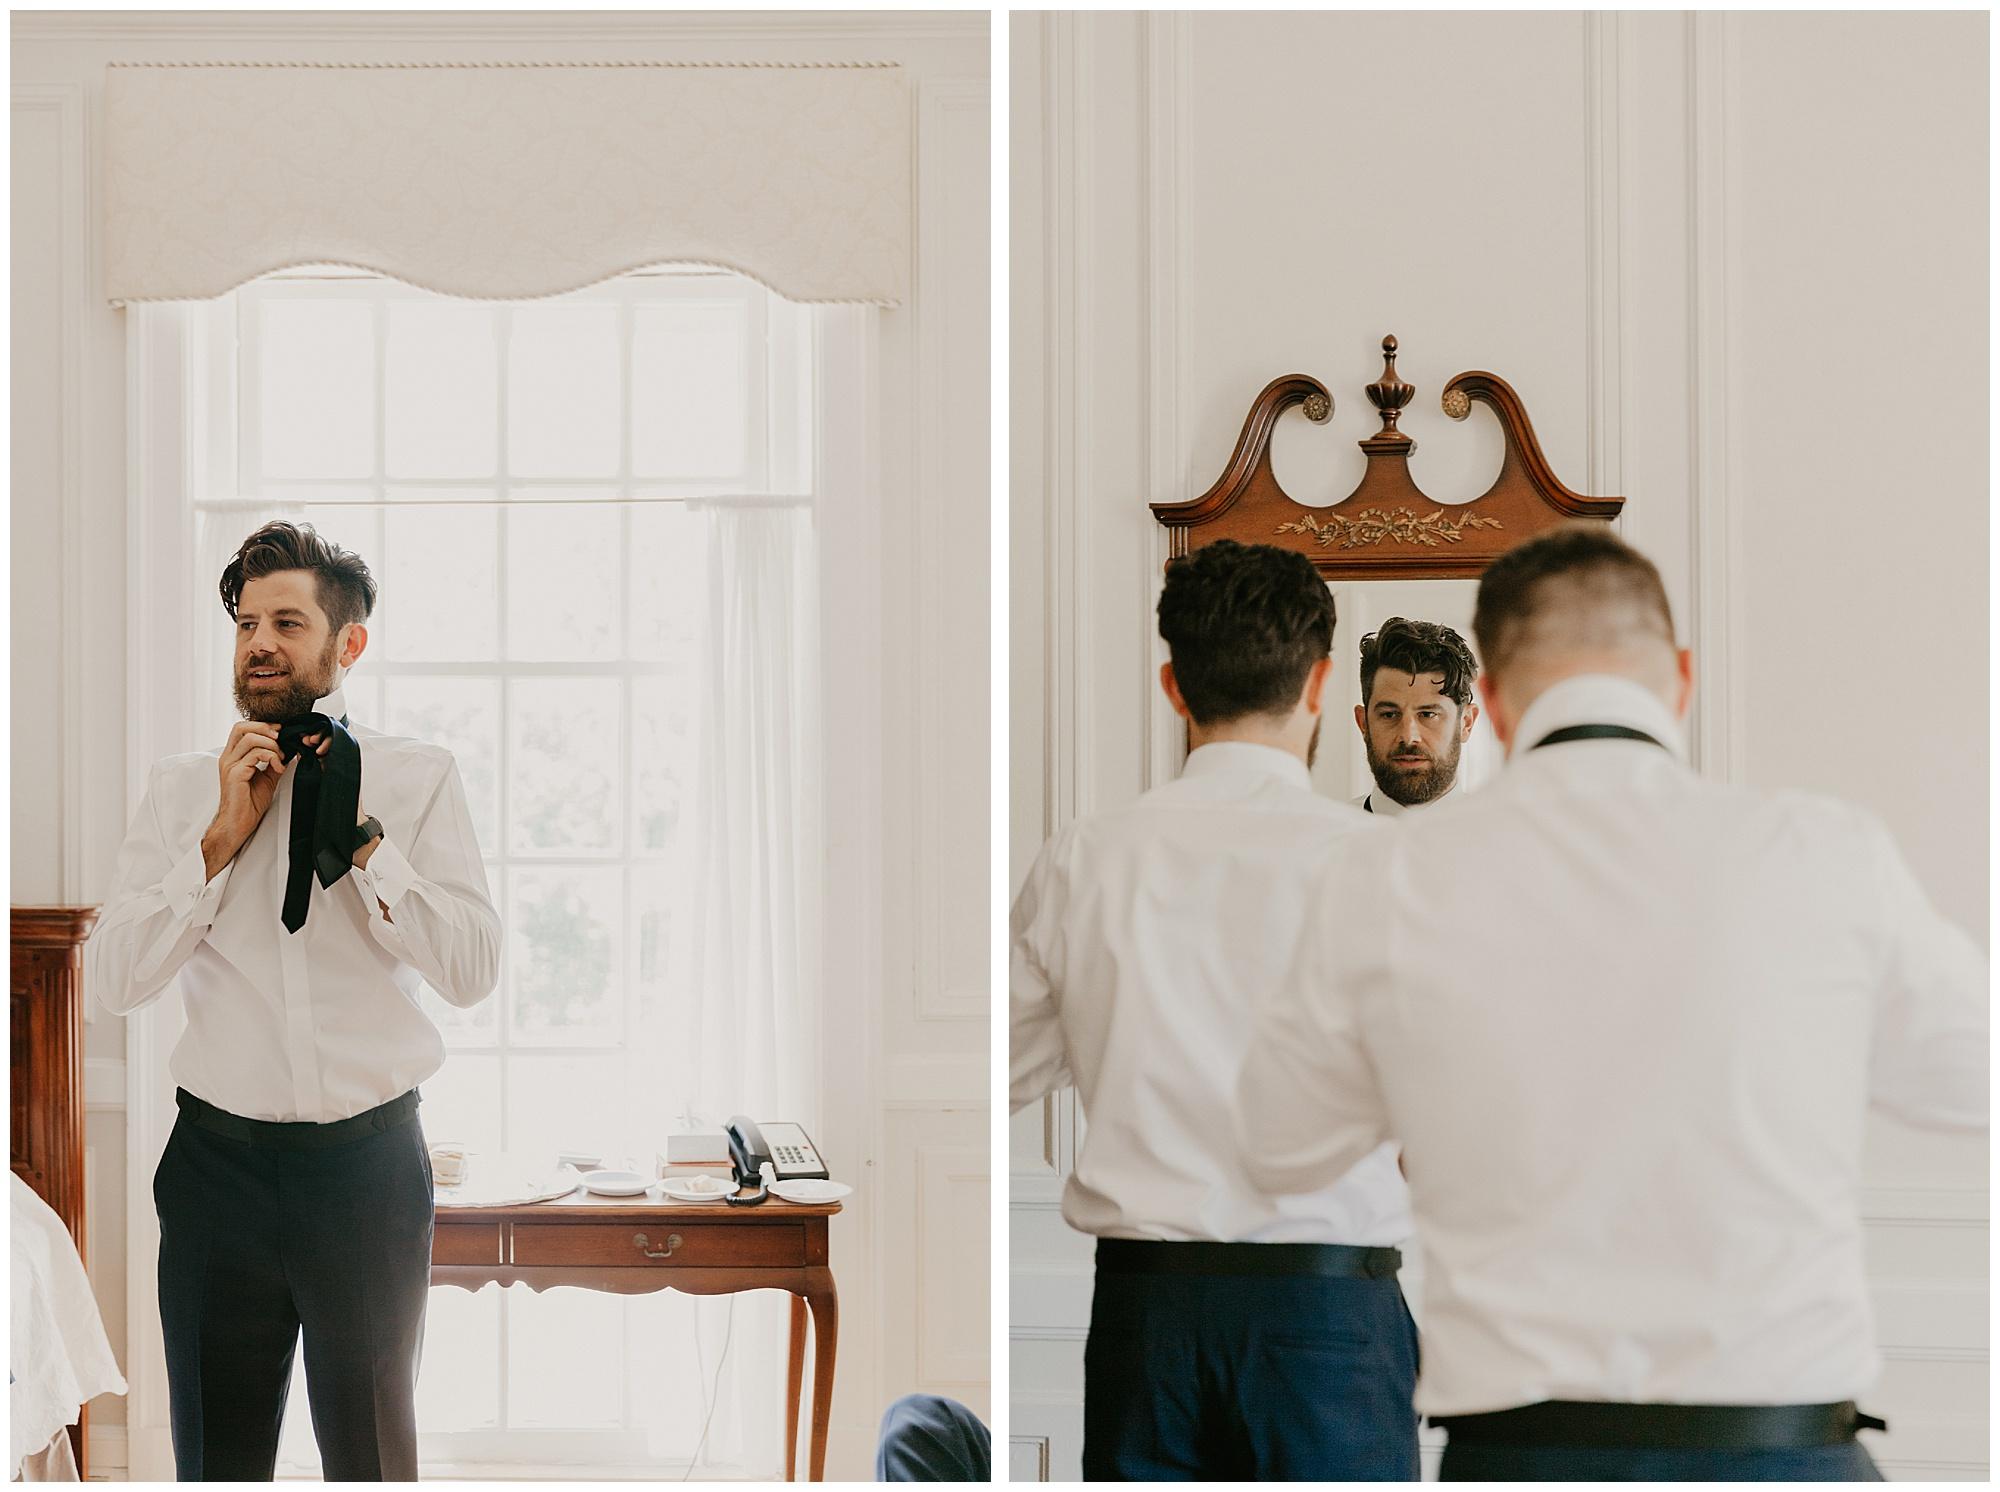 allerton_park_wedding_champaign_il_chicago_wright_photographs_ne_0002.jpg